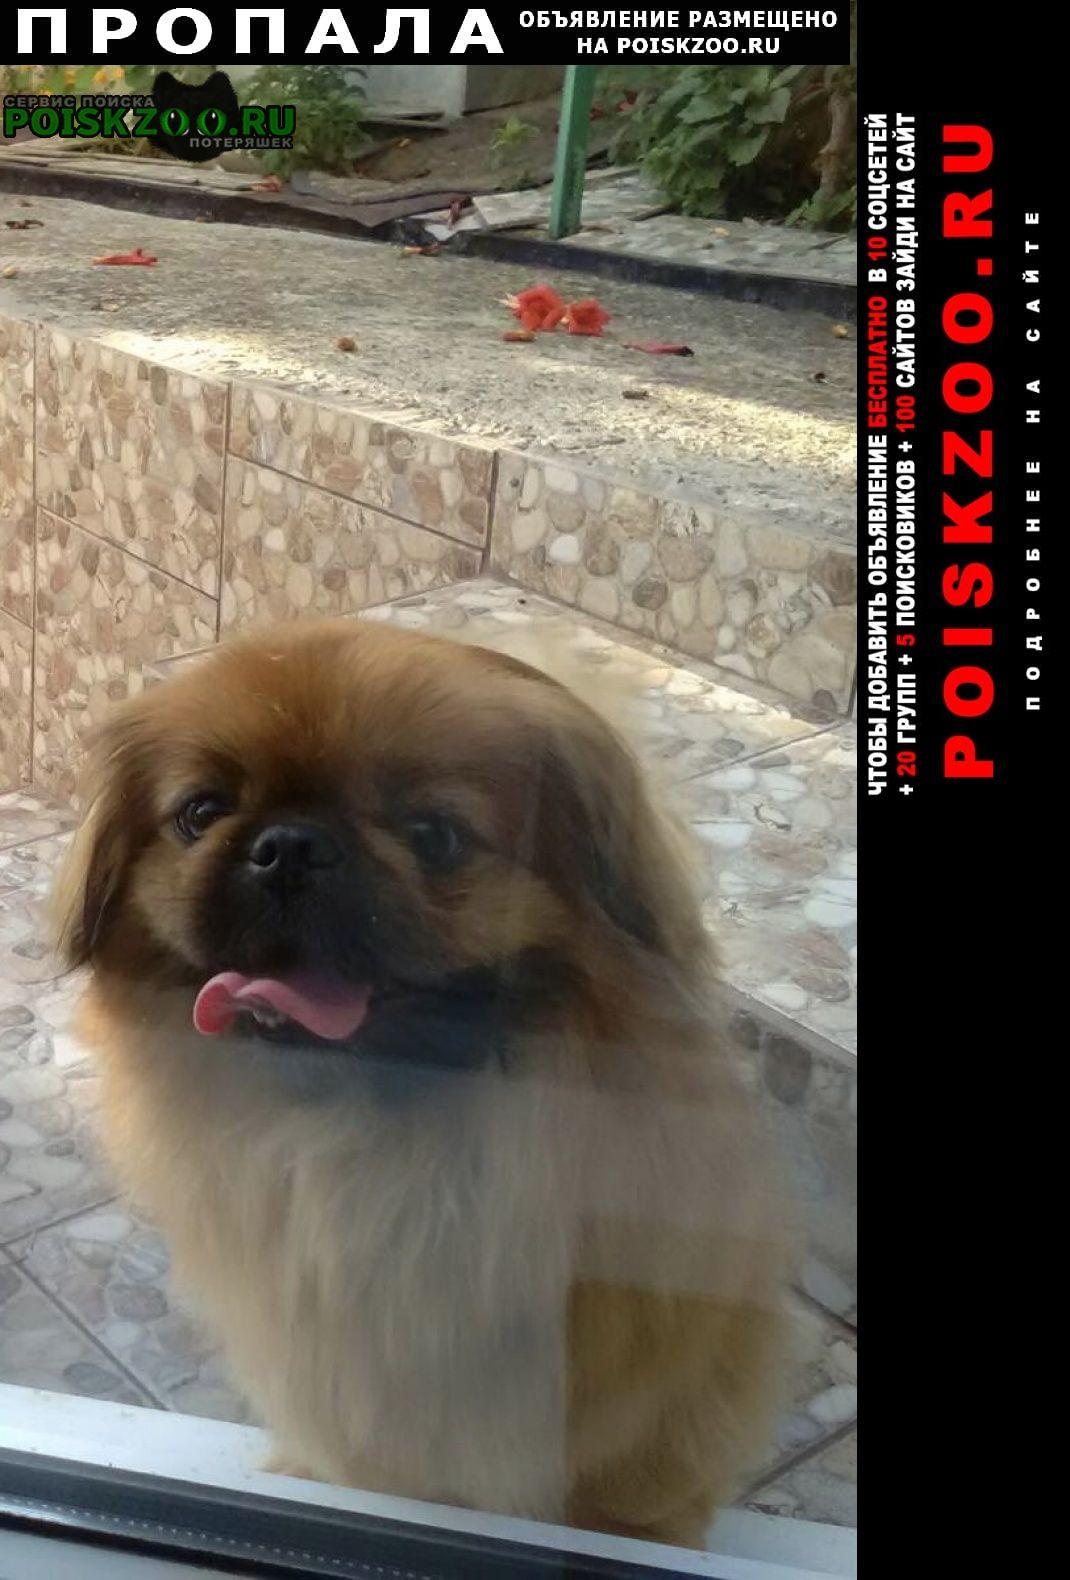 Пропала собака, хутор николаенко Апшеронск